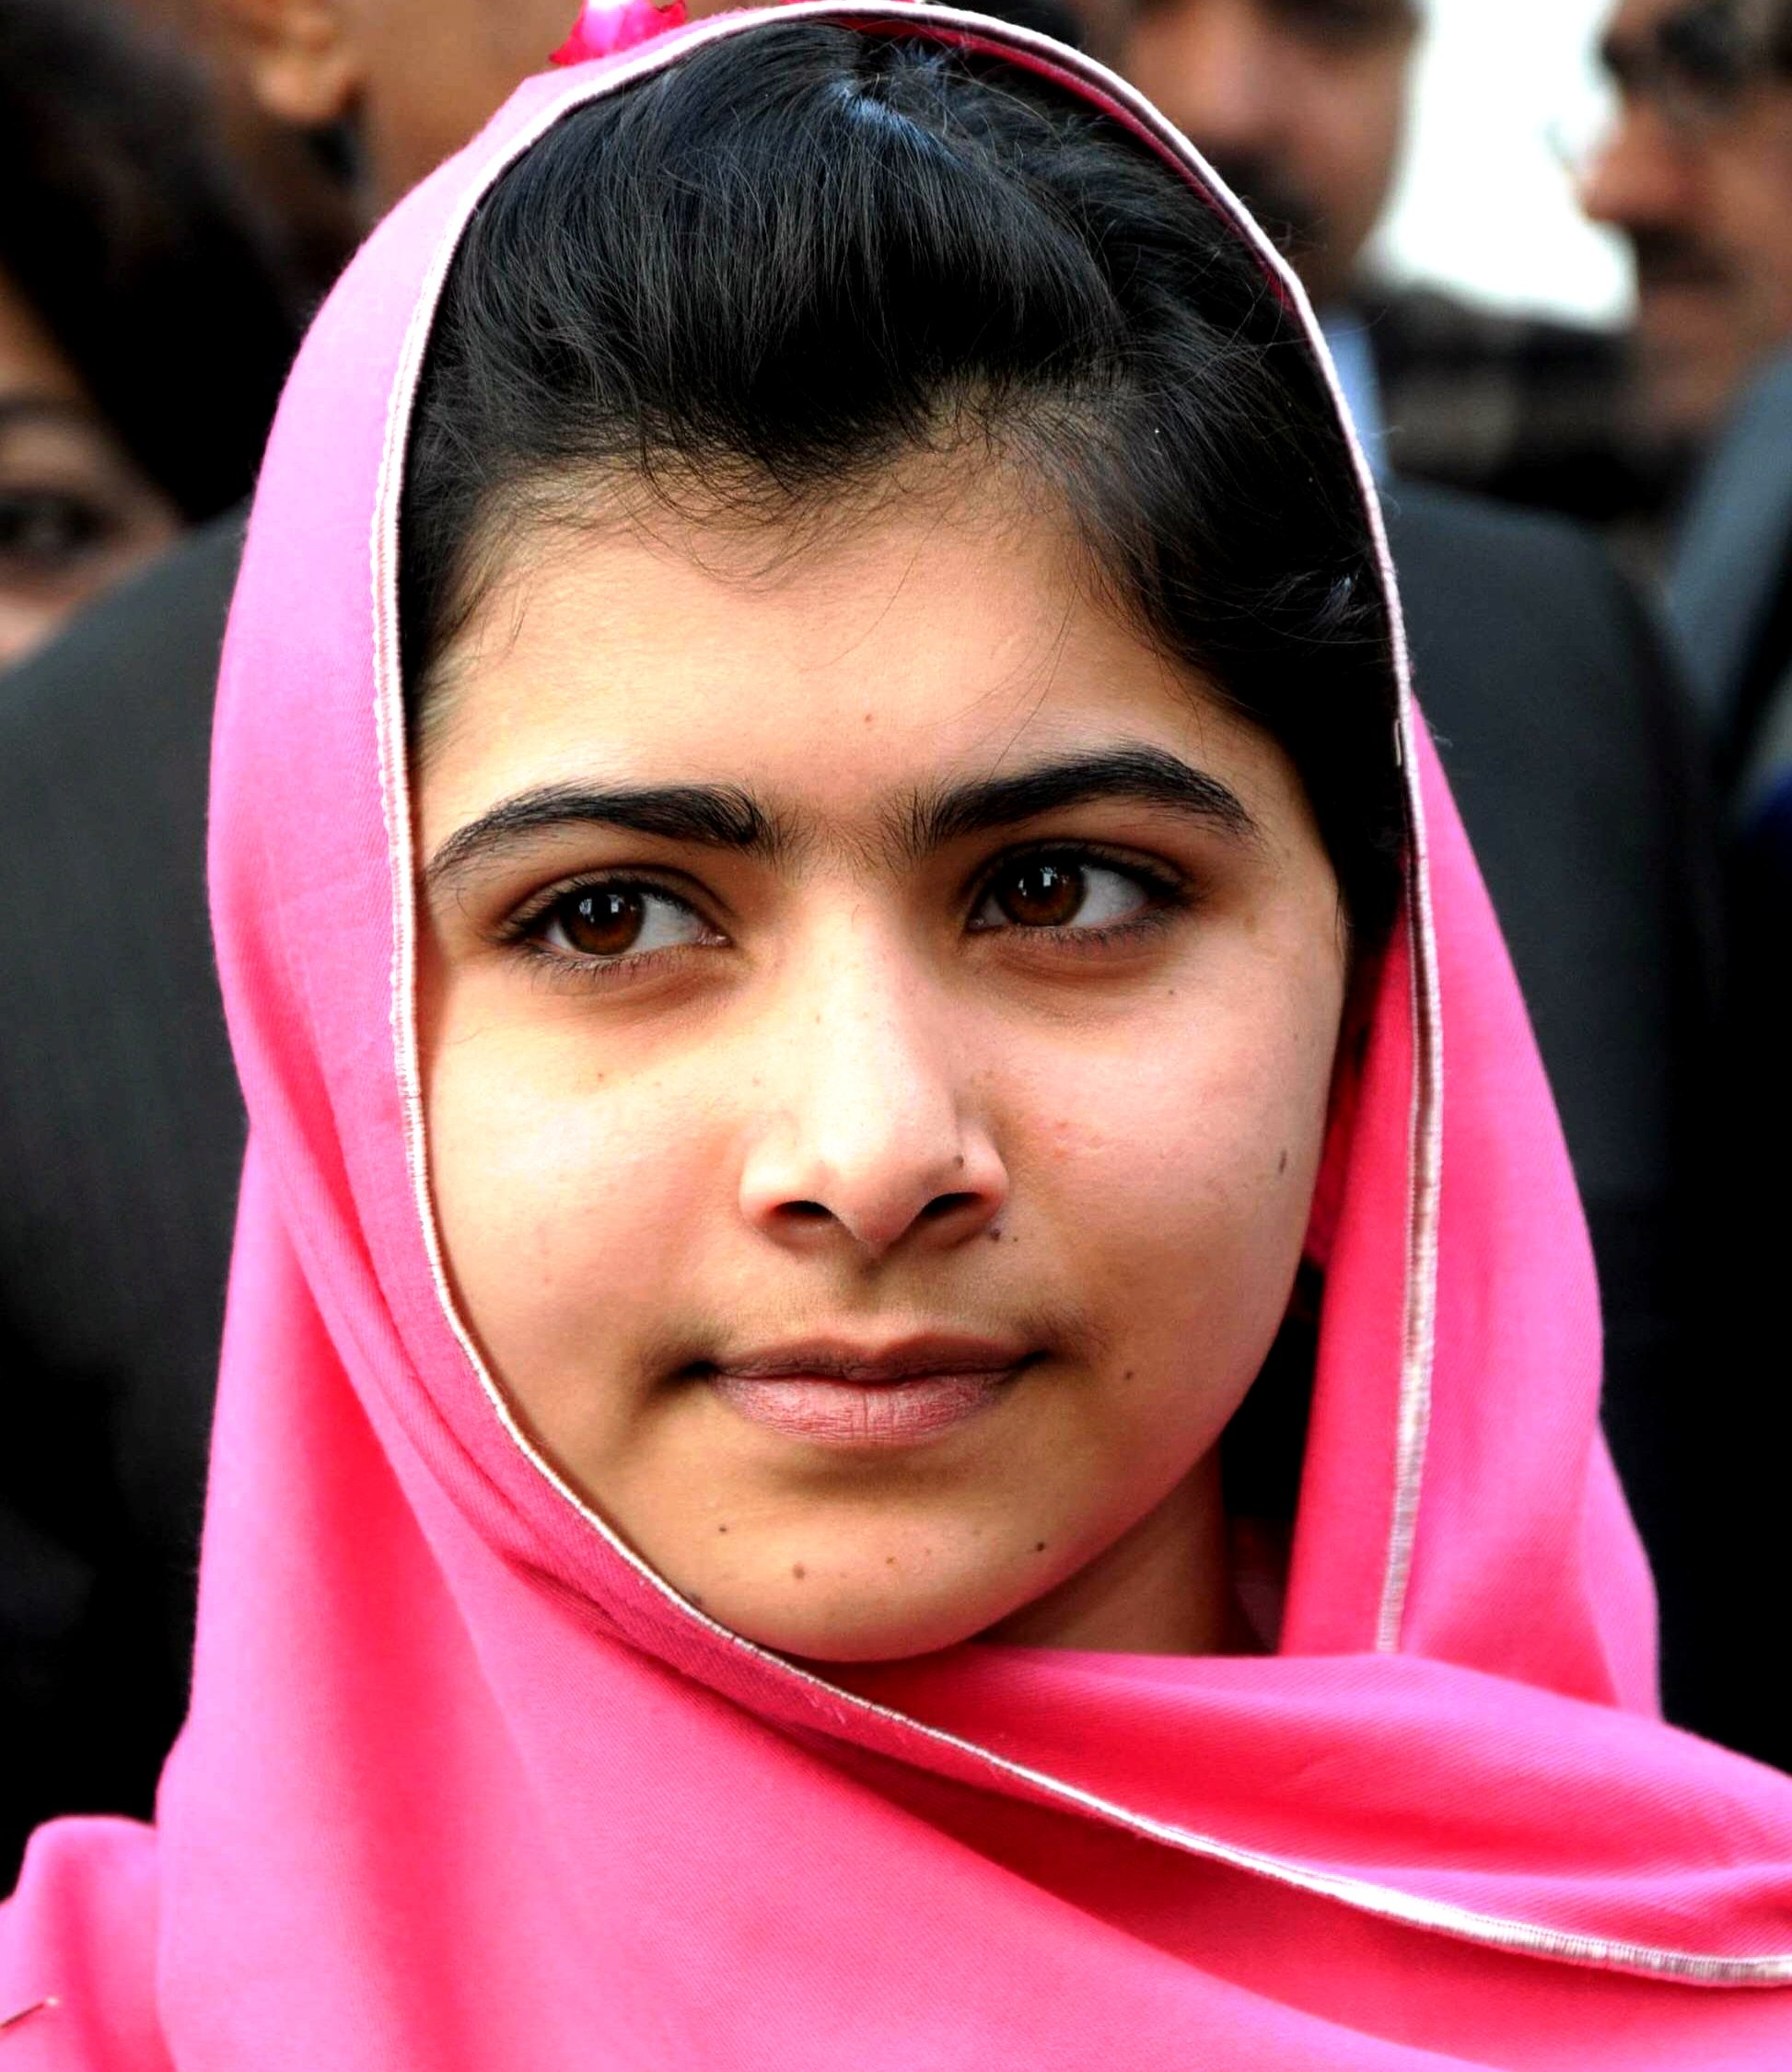 teenage activist wins 2012 tipperary international peace award photo rashid ajmeri file